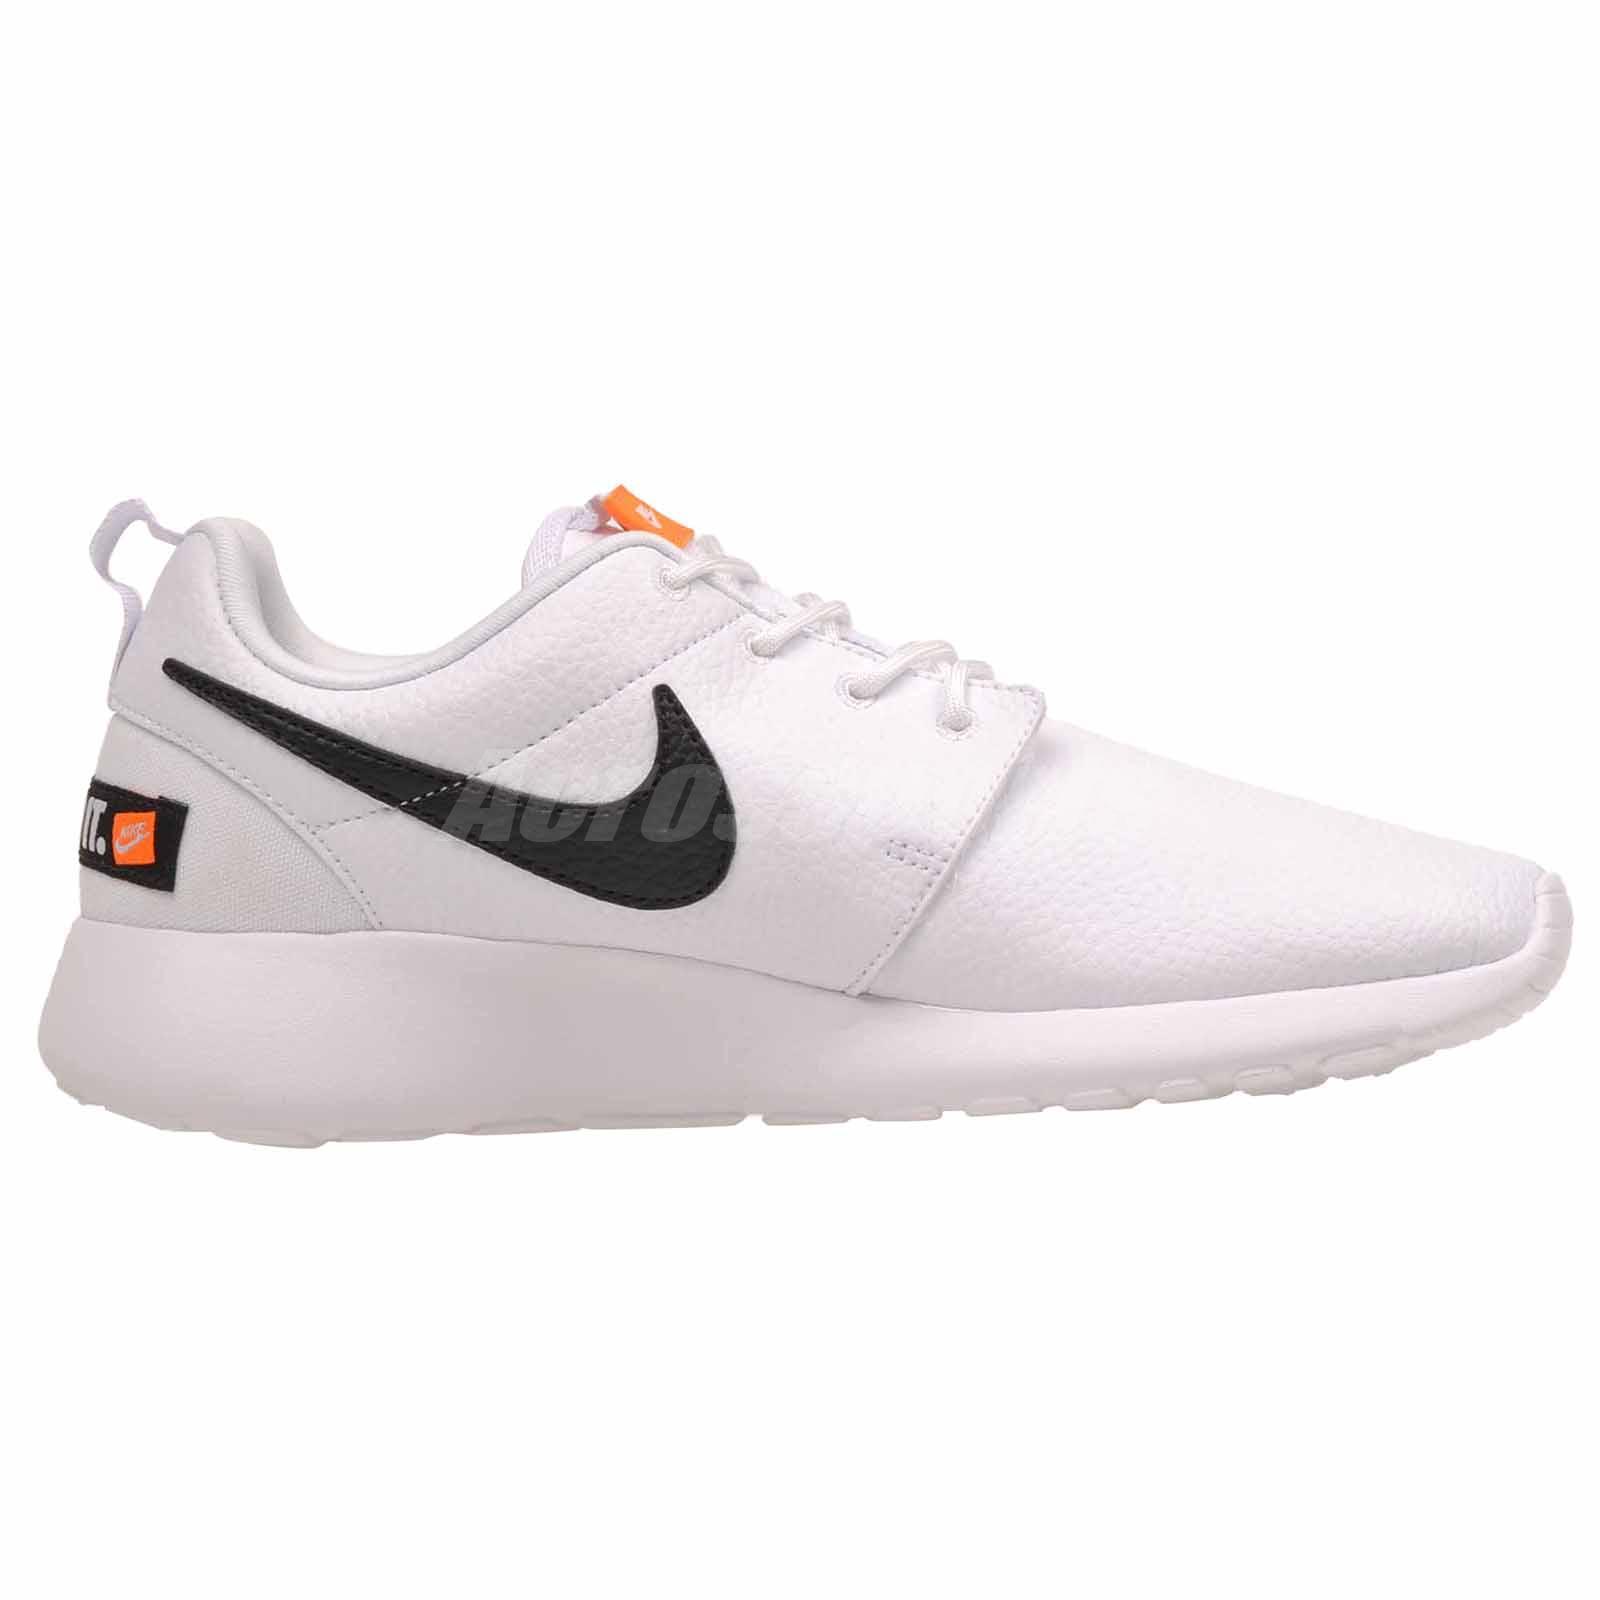 3b47b5a8d3de7 Nike Wmns Roshe One PRM Running Womens Premium Shoes NWOB White ...